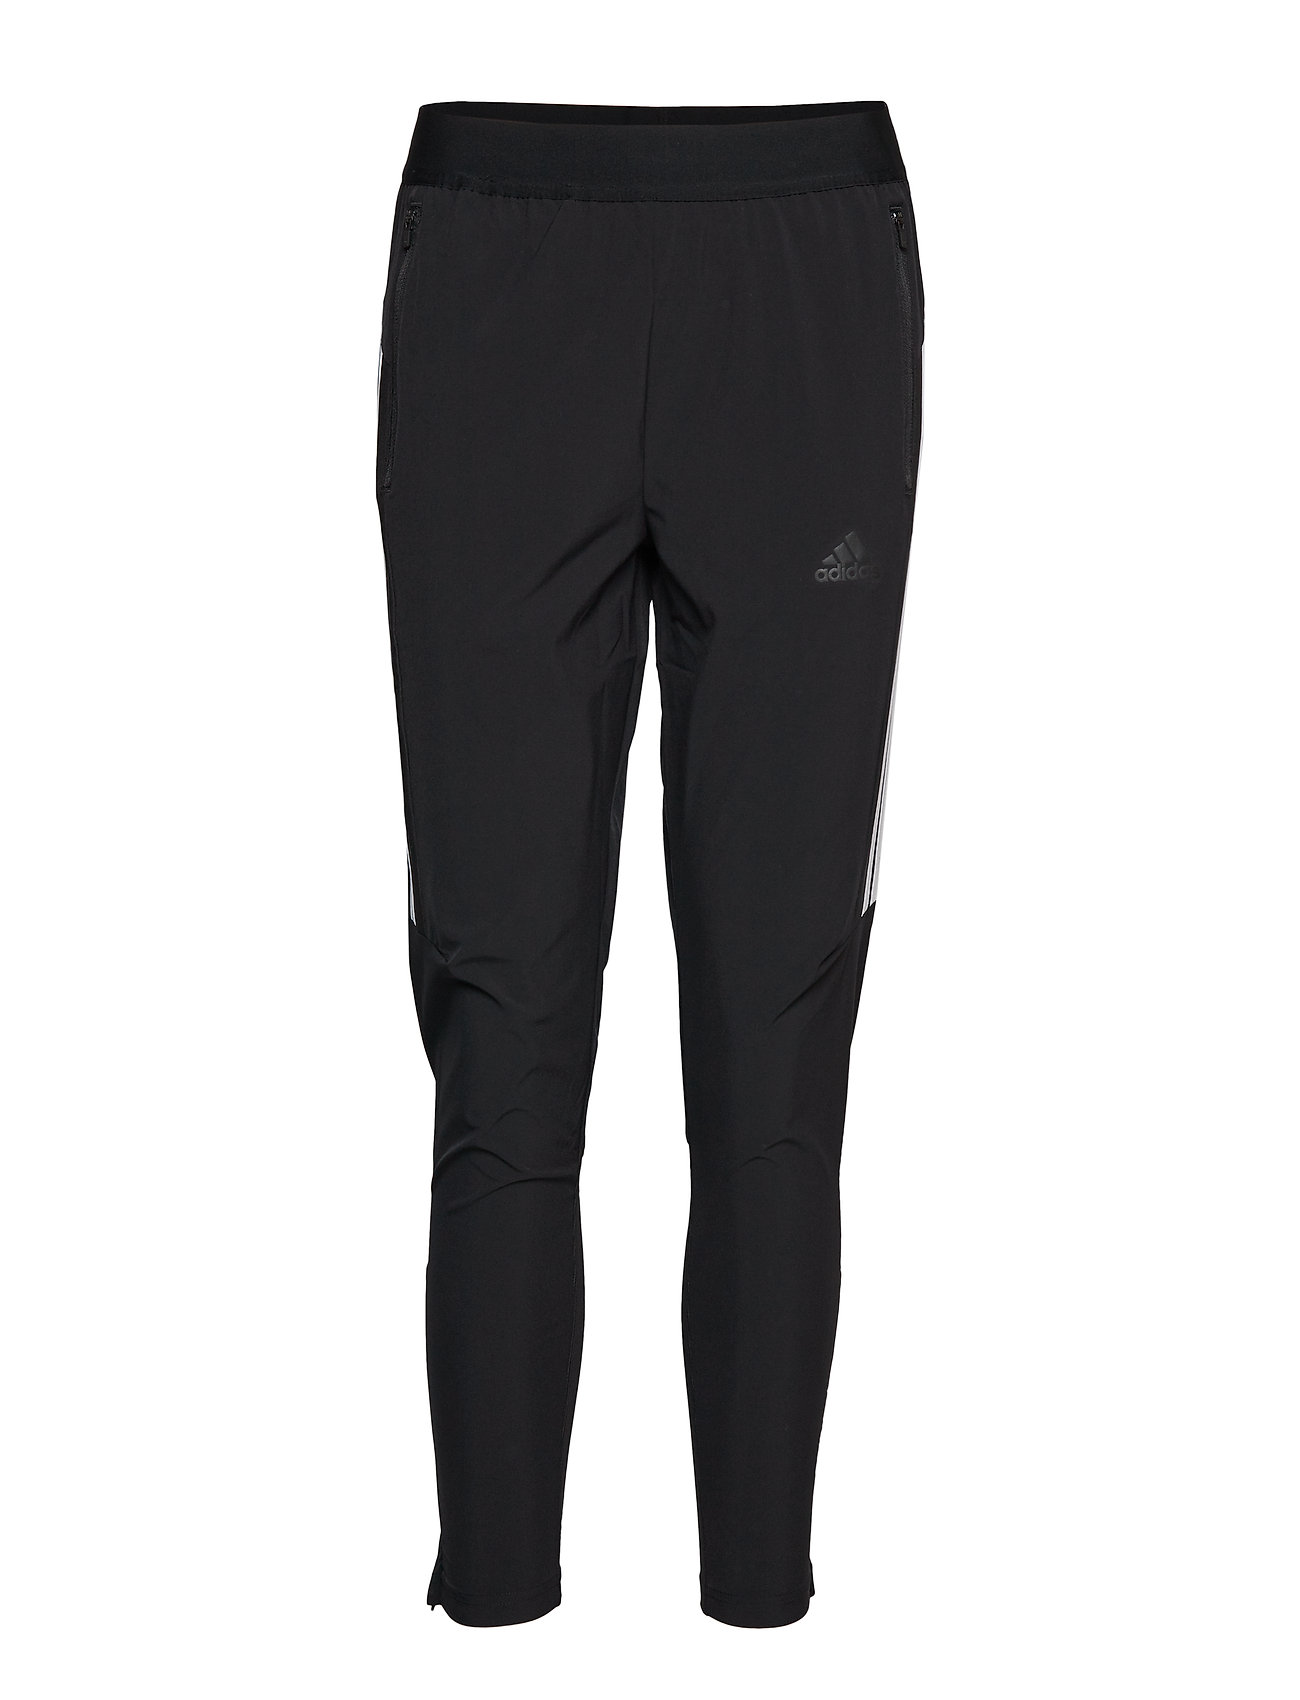 adidas Performance 3S WVN TRG P - BLACK/WHITE